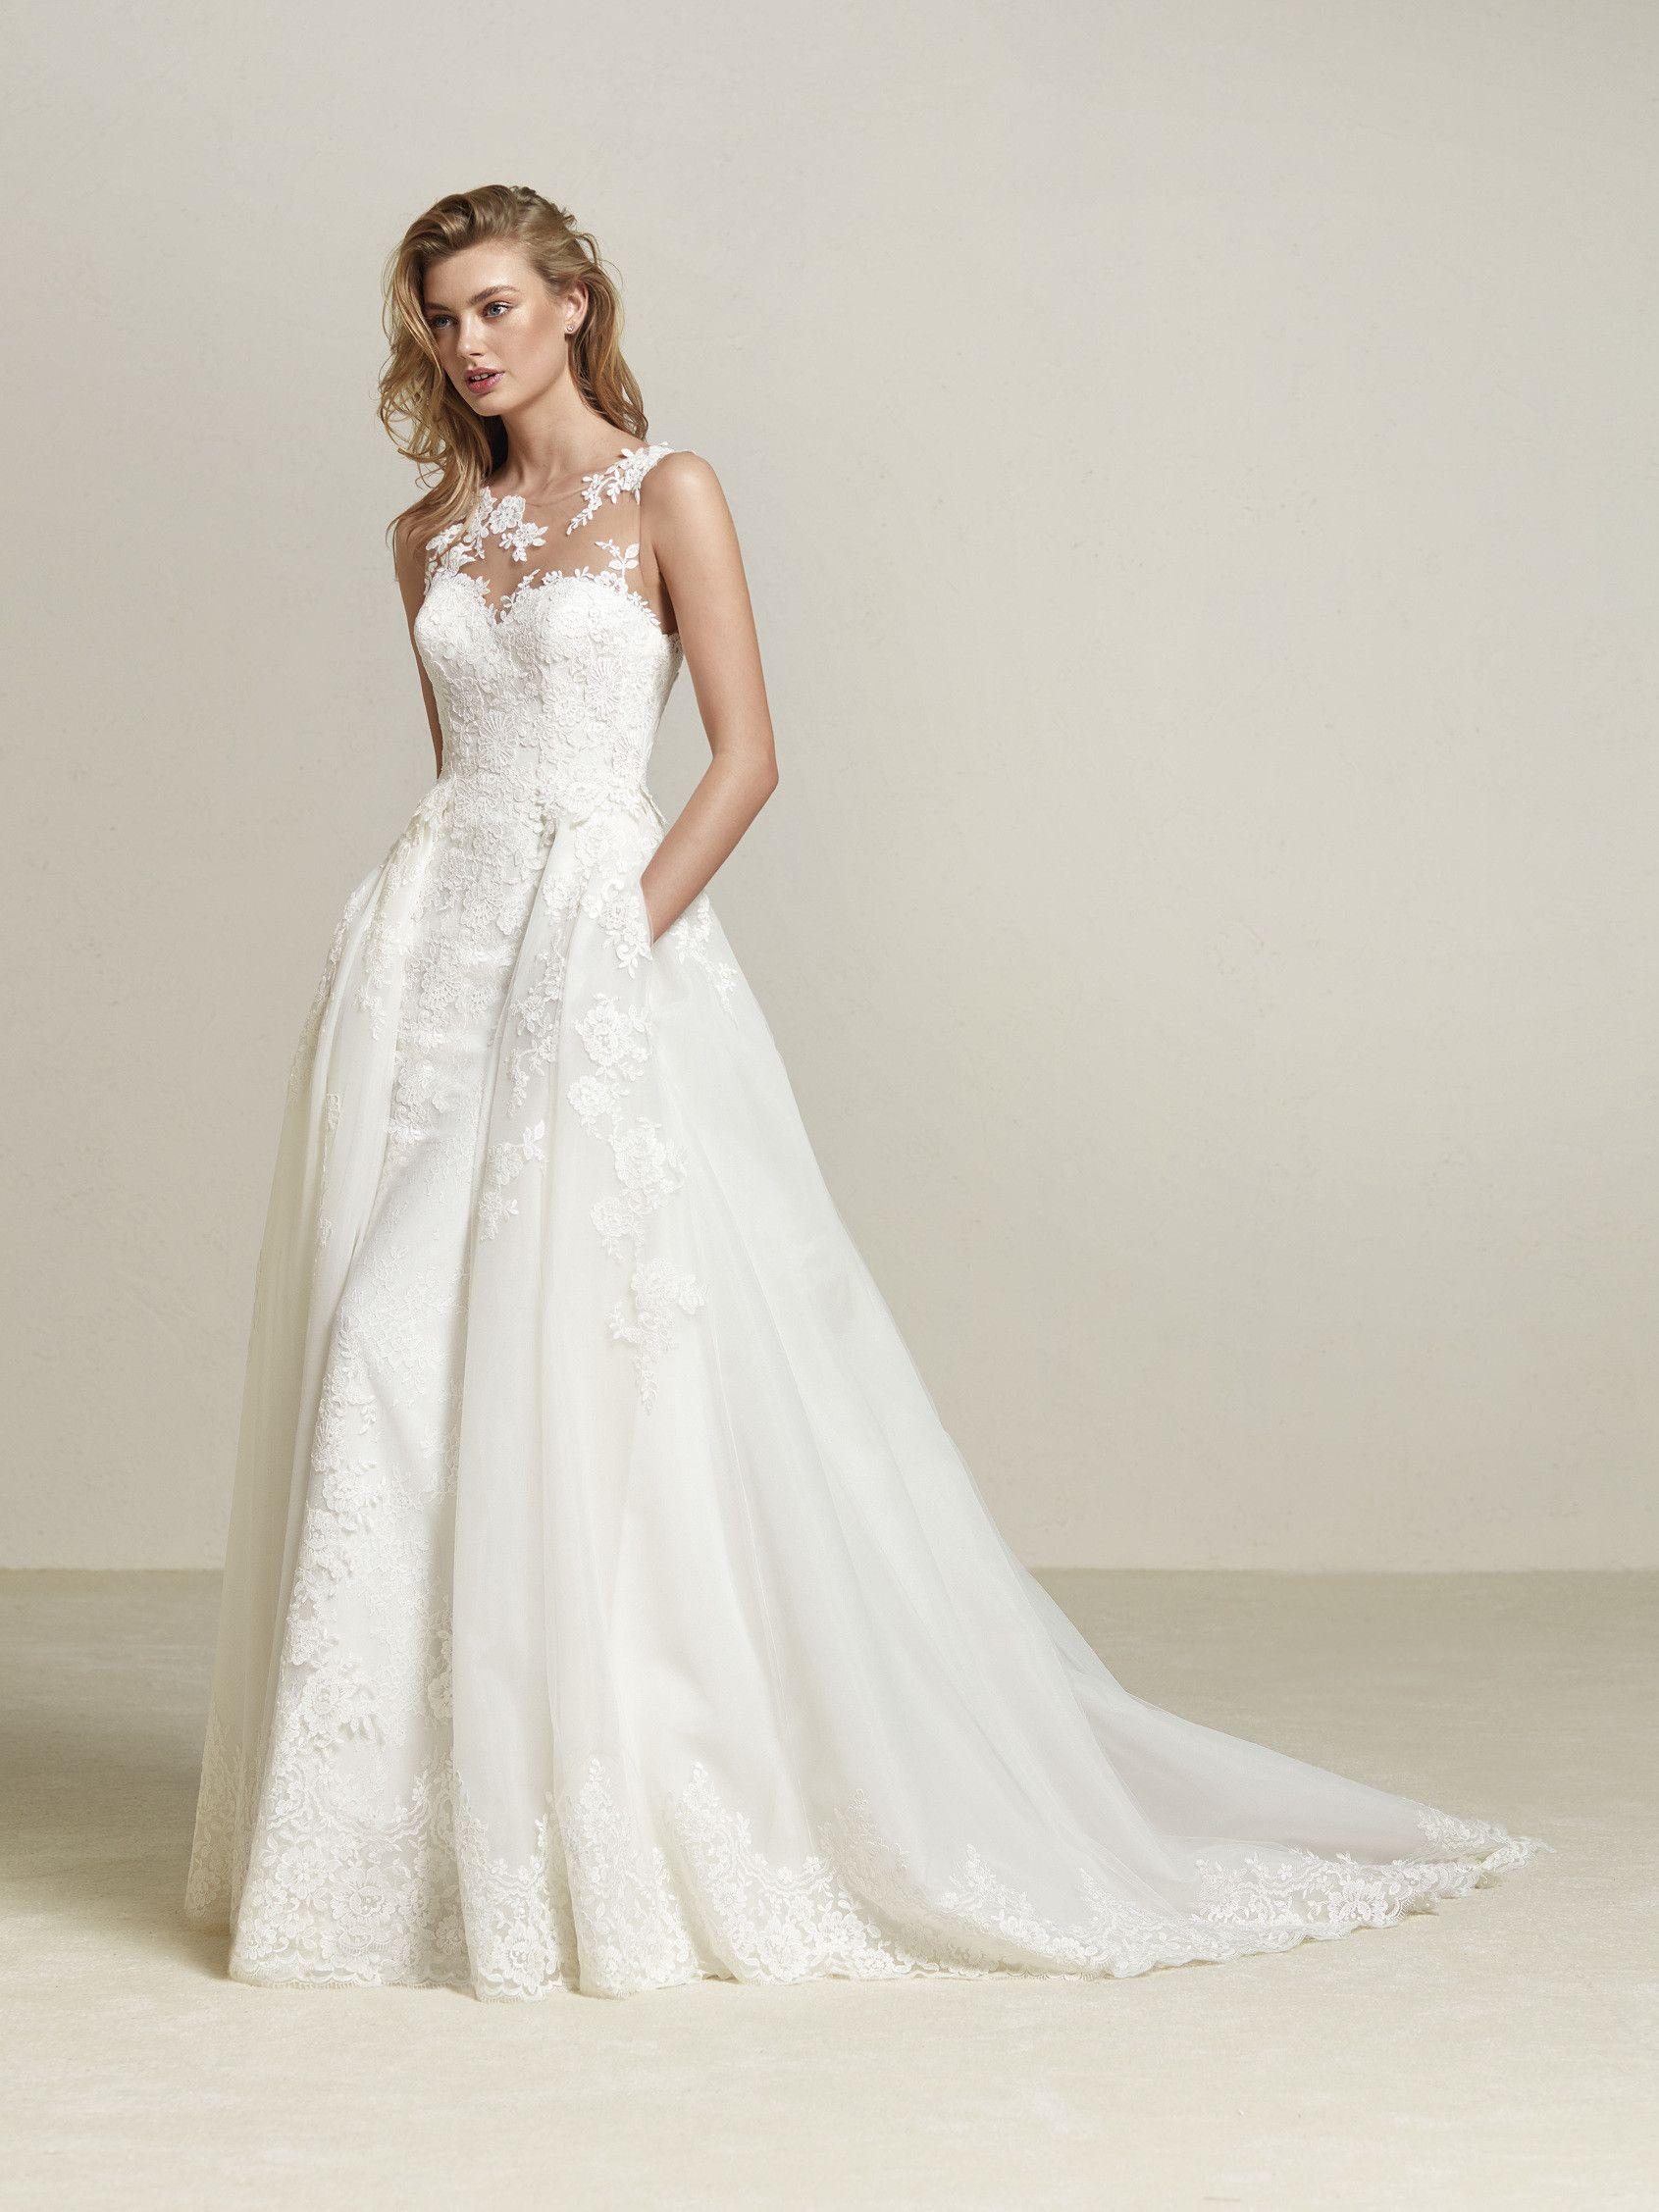 Drum wedding dress large detachable overskirt pronovias for Wedding dress with overskirt